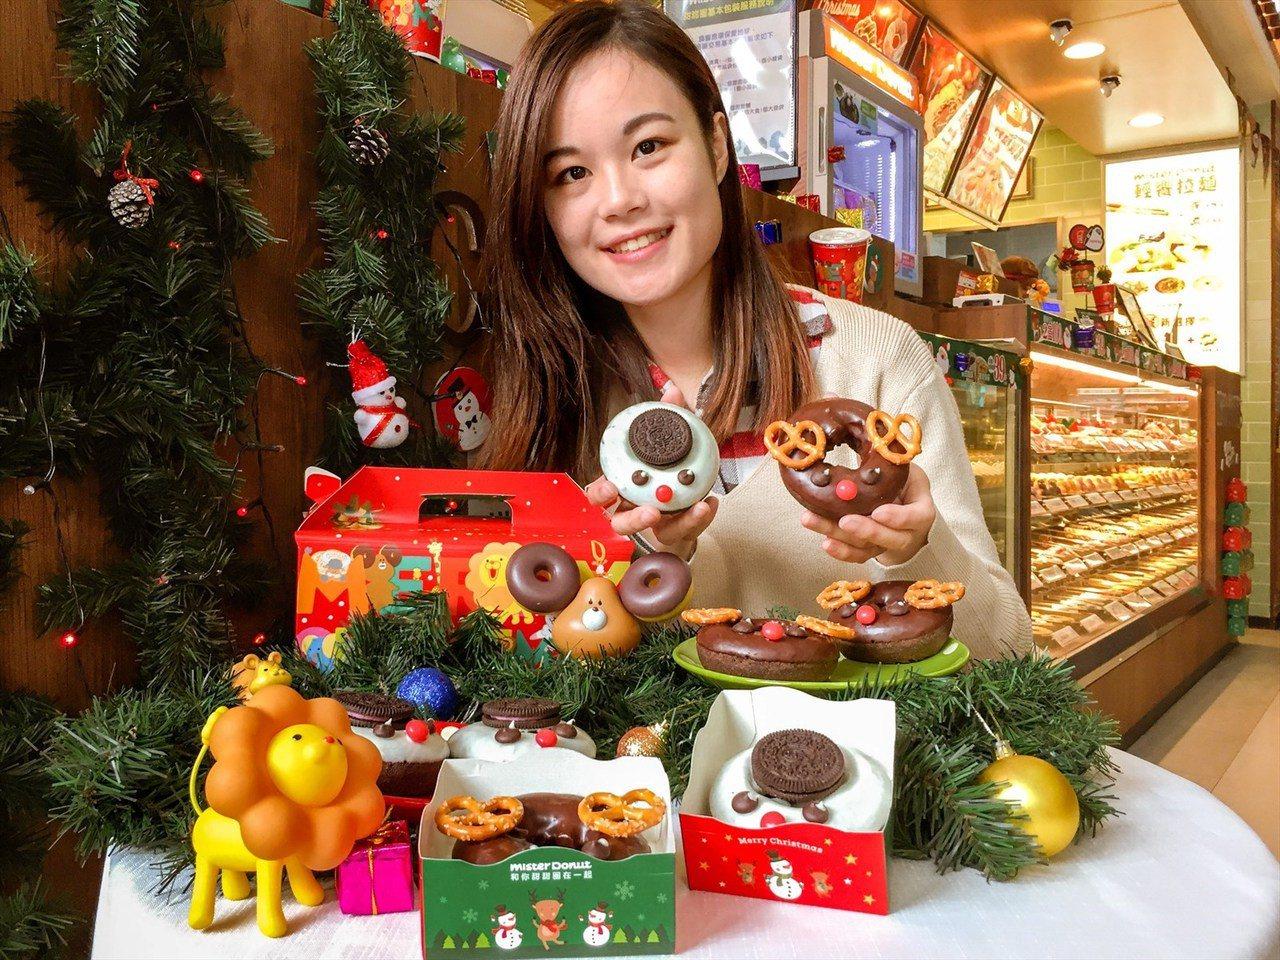 ▲Mister Donut推出耶誕雪人、耶誕馴鹿甜甜圈